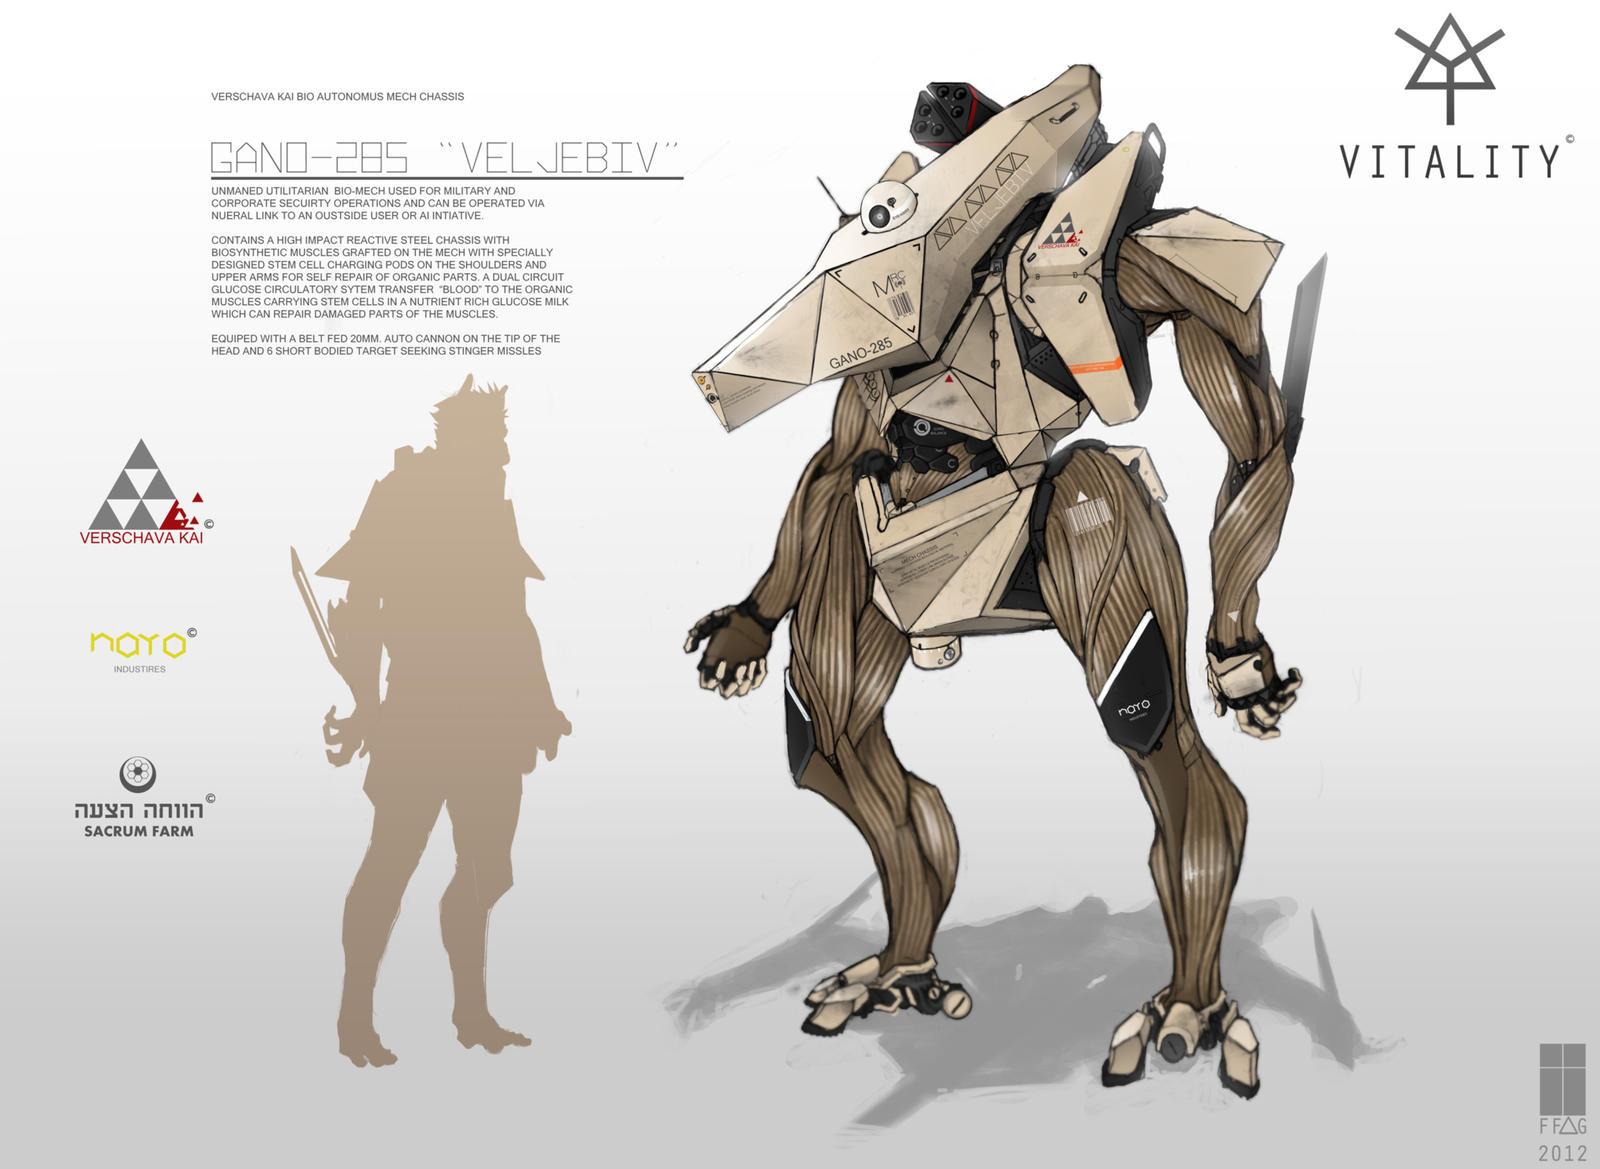 Vitality: 'VELJEBIV' BioMech by FutureFavorite